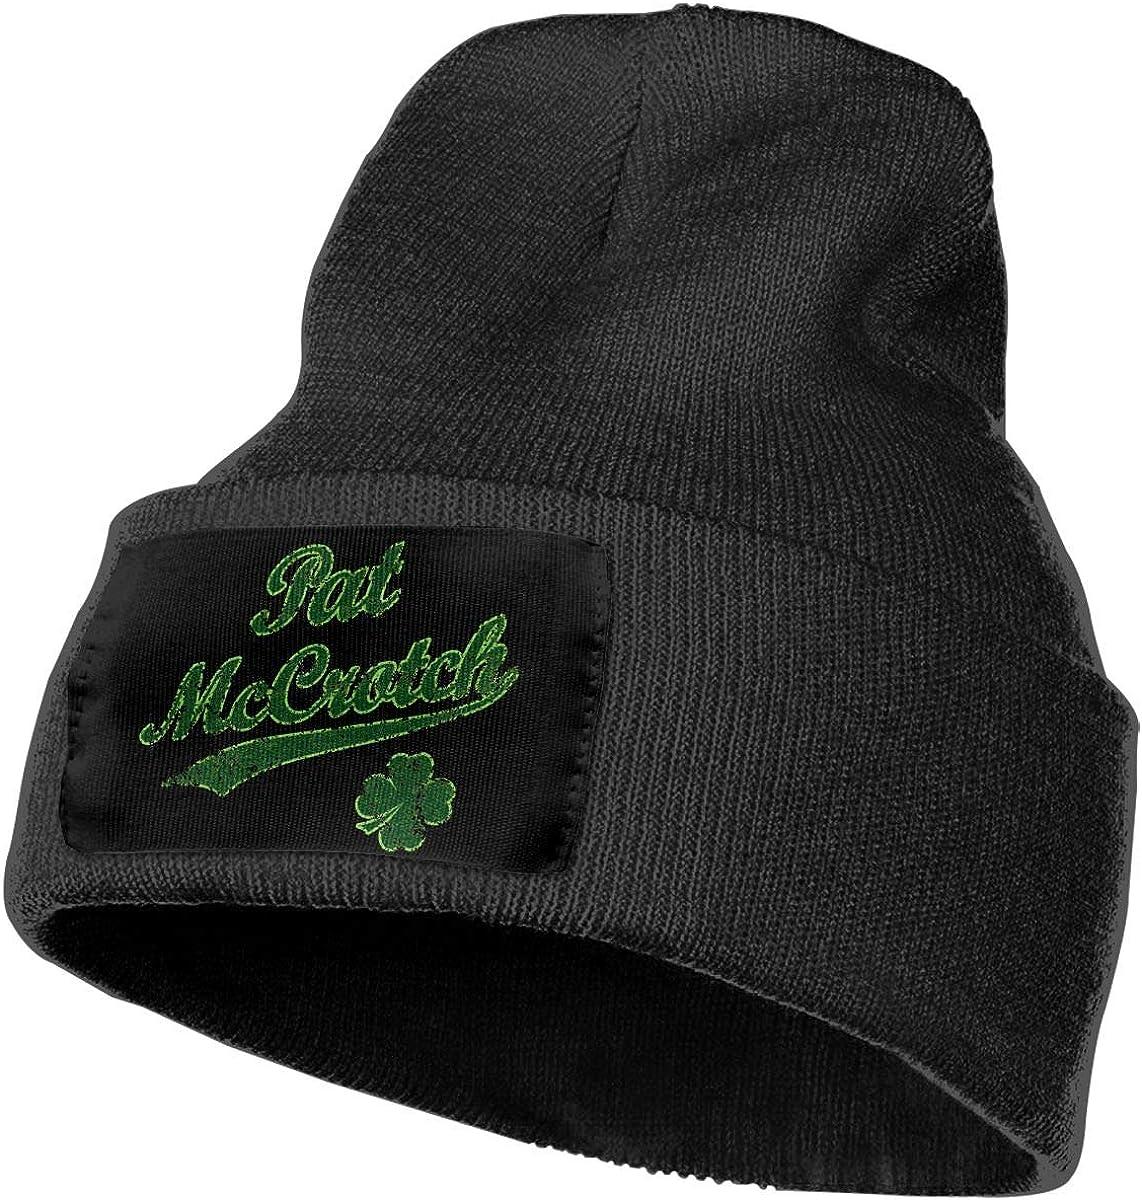 Nspndrktxt Vintage Pat McCrotch Funny Unisex Fashion Knitted Hat Luxury Hip-Hop Cap